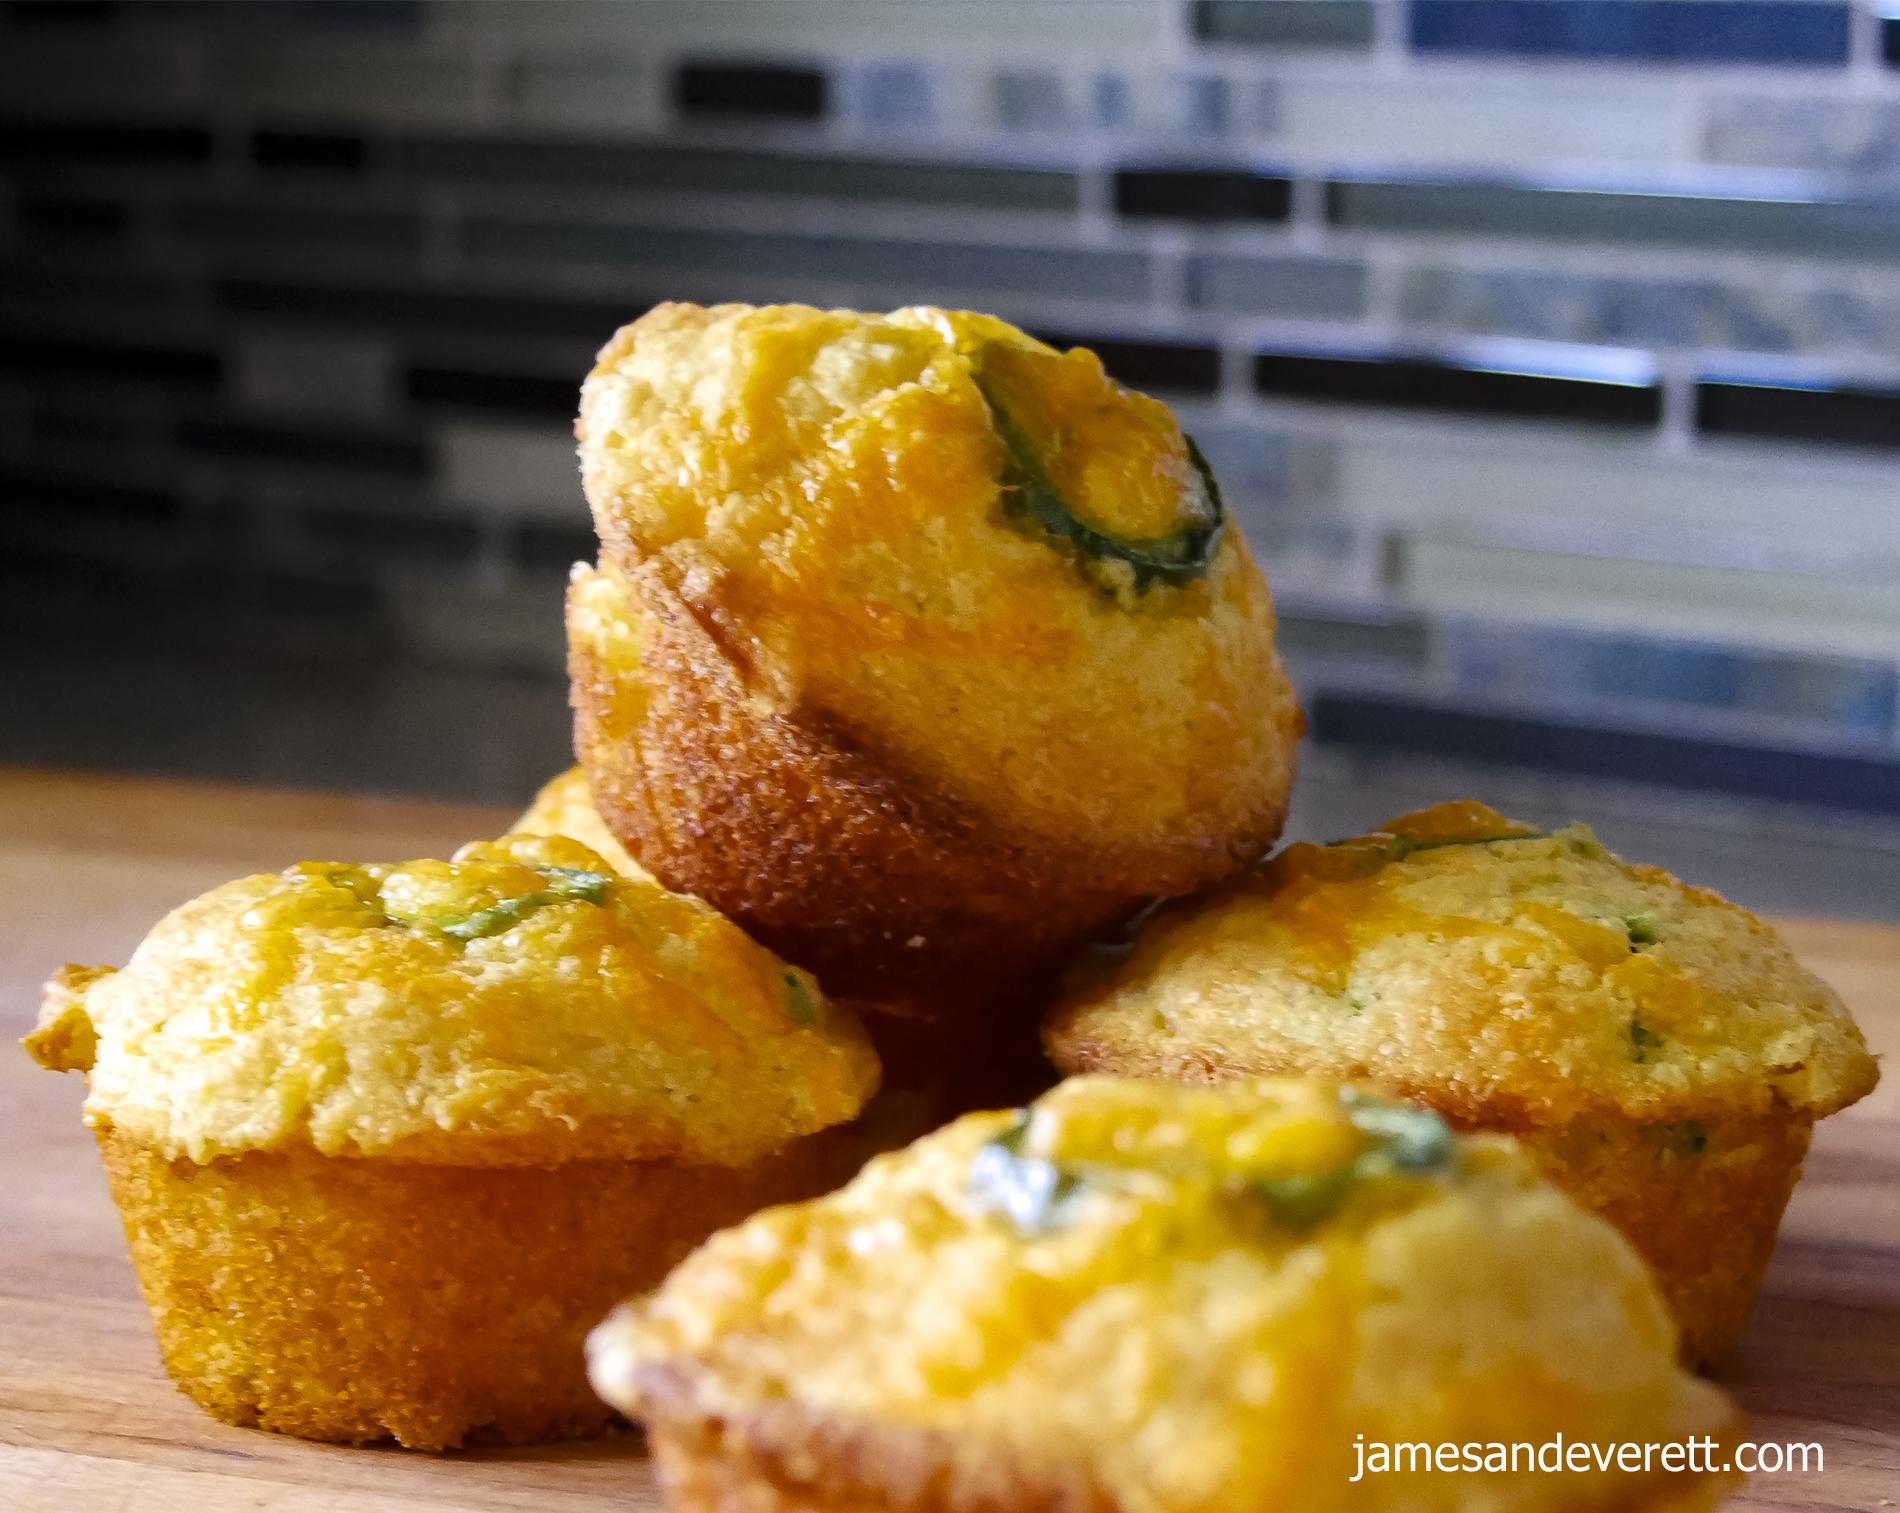 Jalapeno Cheddar Cornbread Muffins